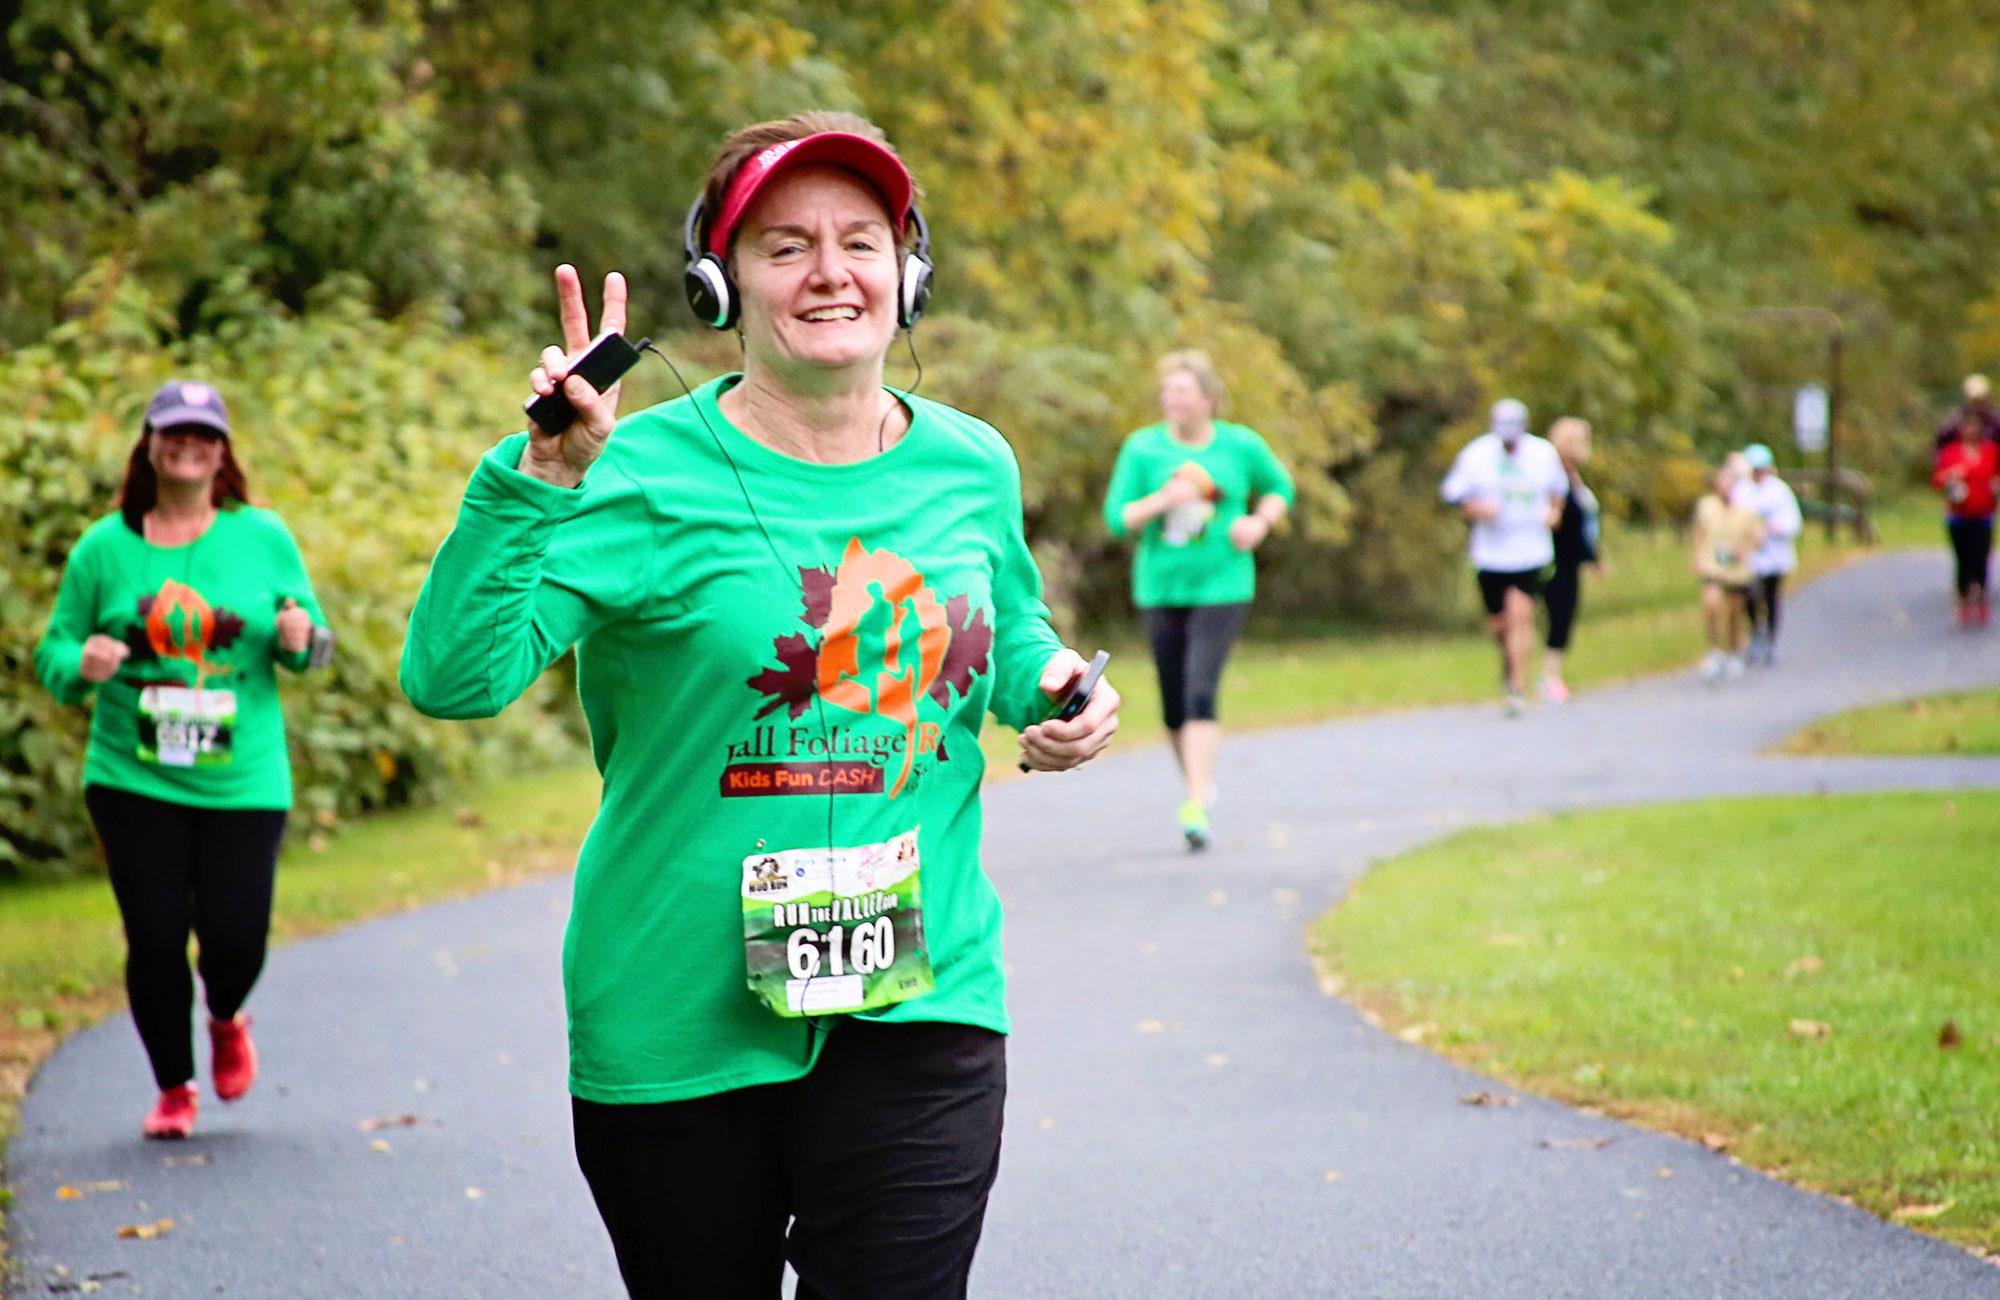 fall foliage race 5k 10k run the valley race series